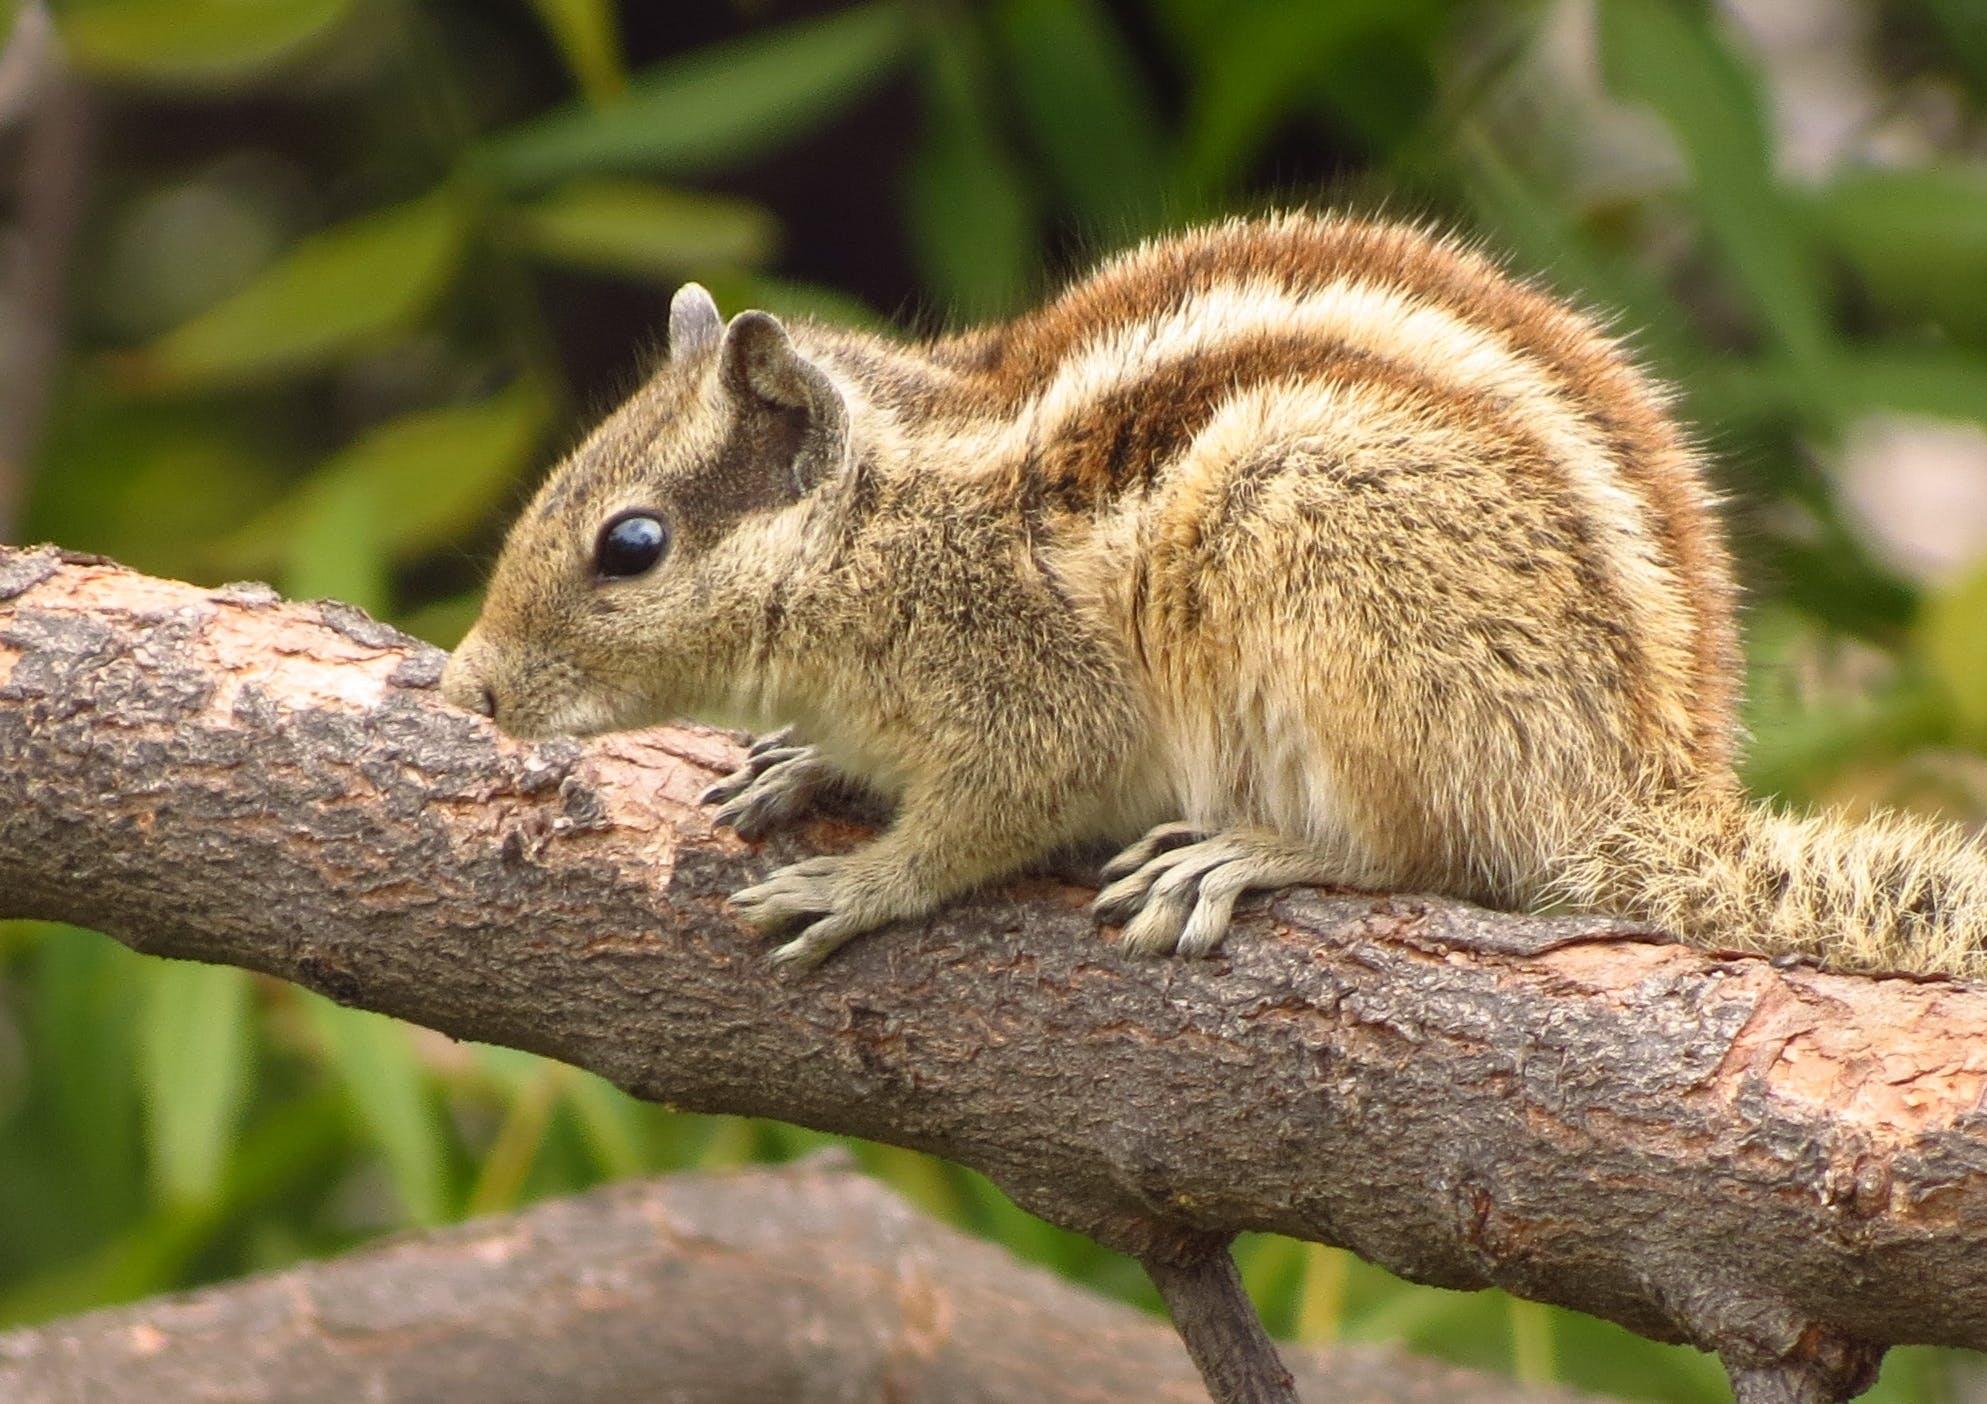 Brown Squirrel Facing Sideways